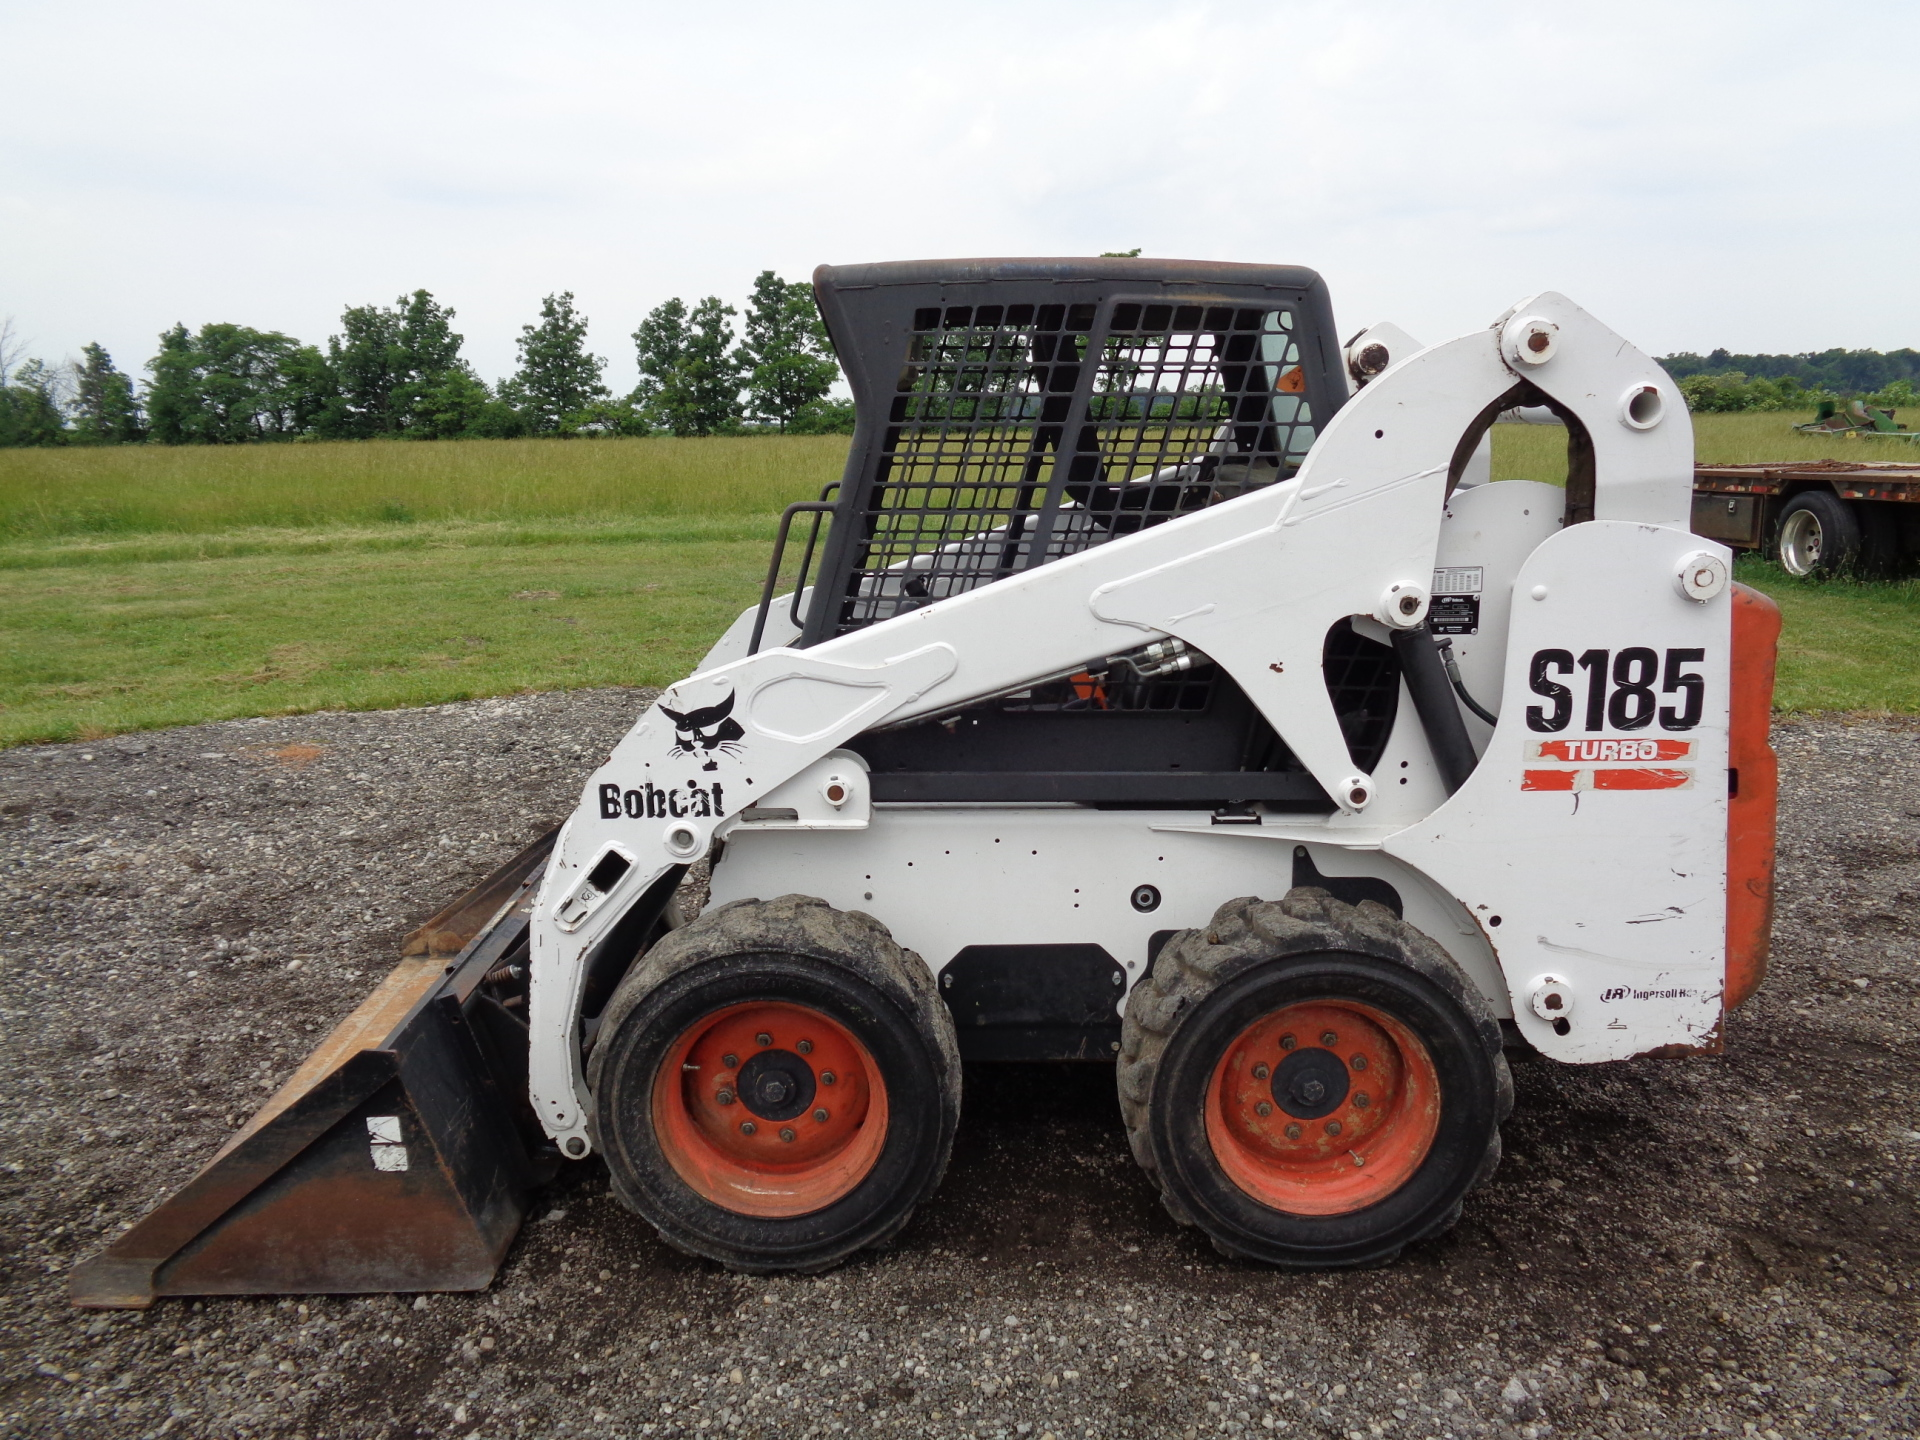 2004 Bobcat S185    $17,900